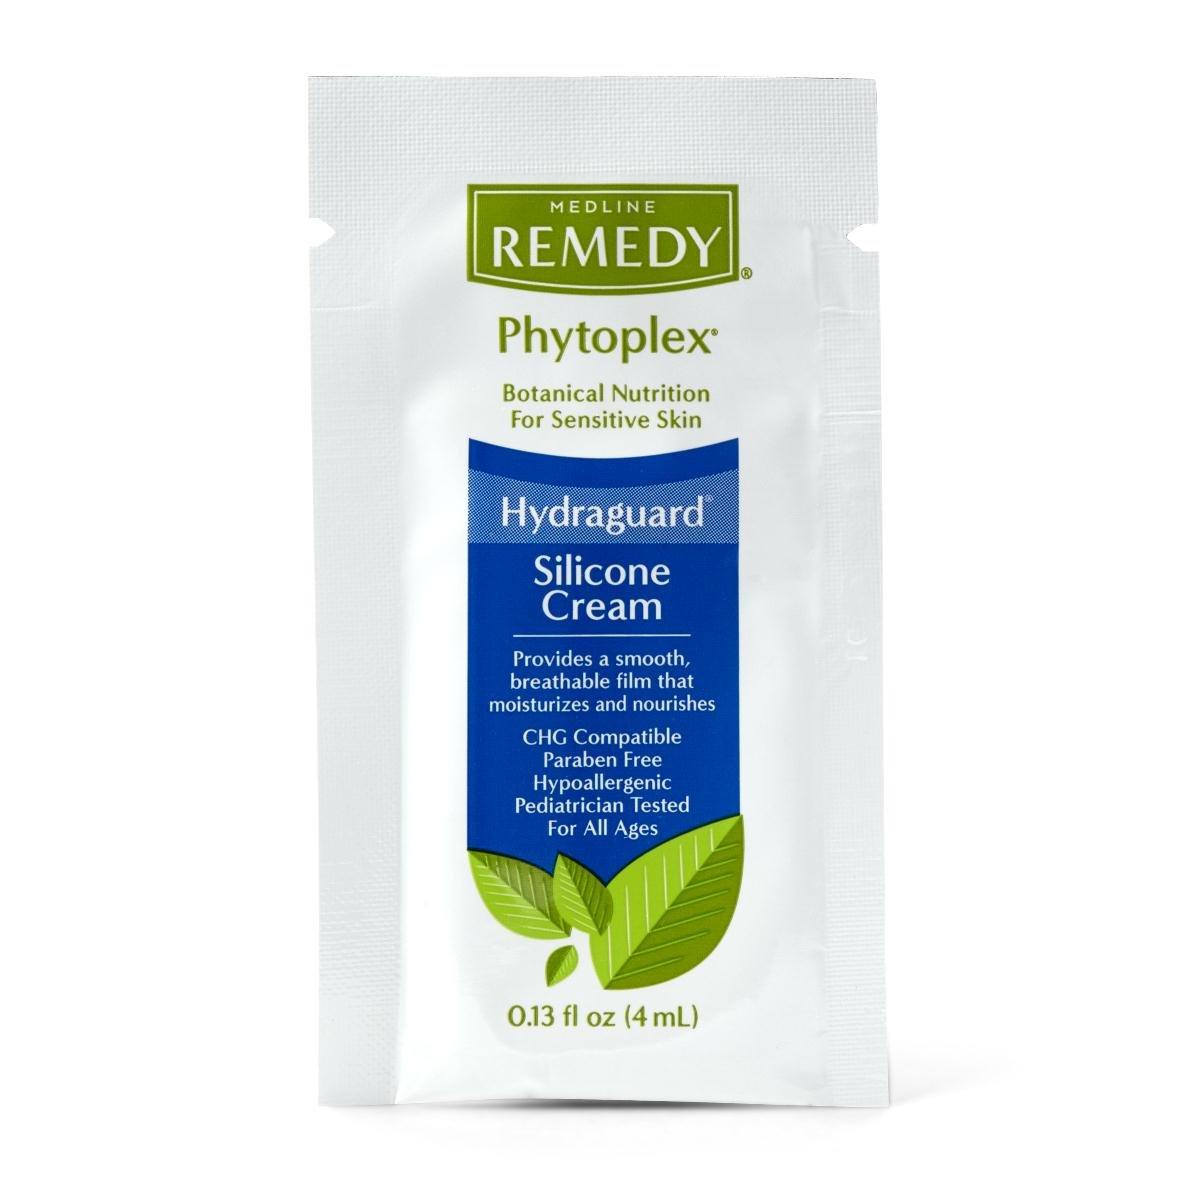 Medline Remedy Phytoplex Hydraguard Cream, 0.13 Ounce, 144 Count